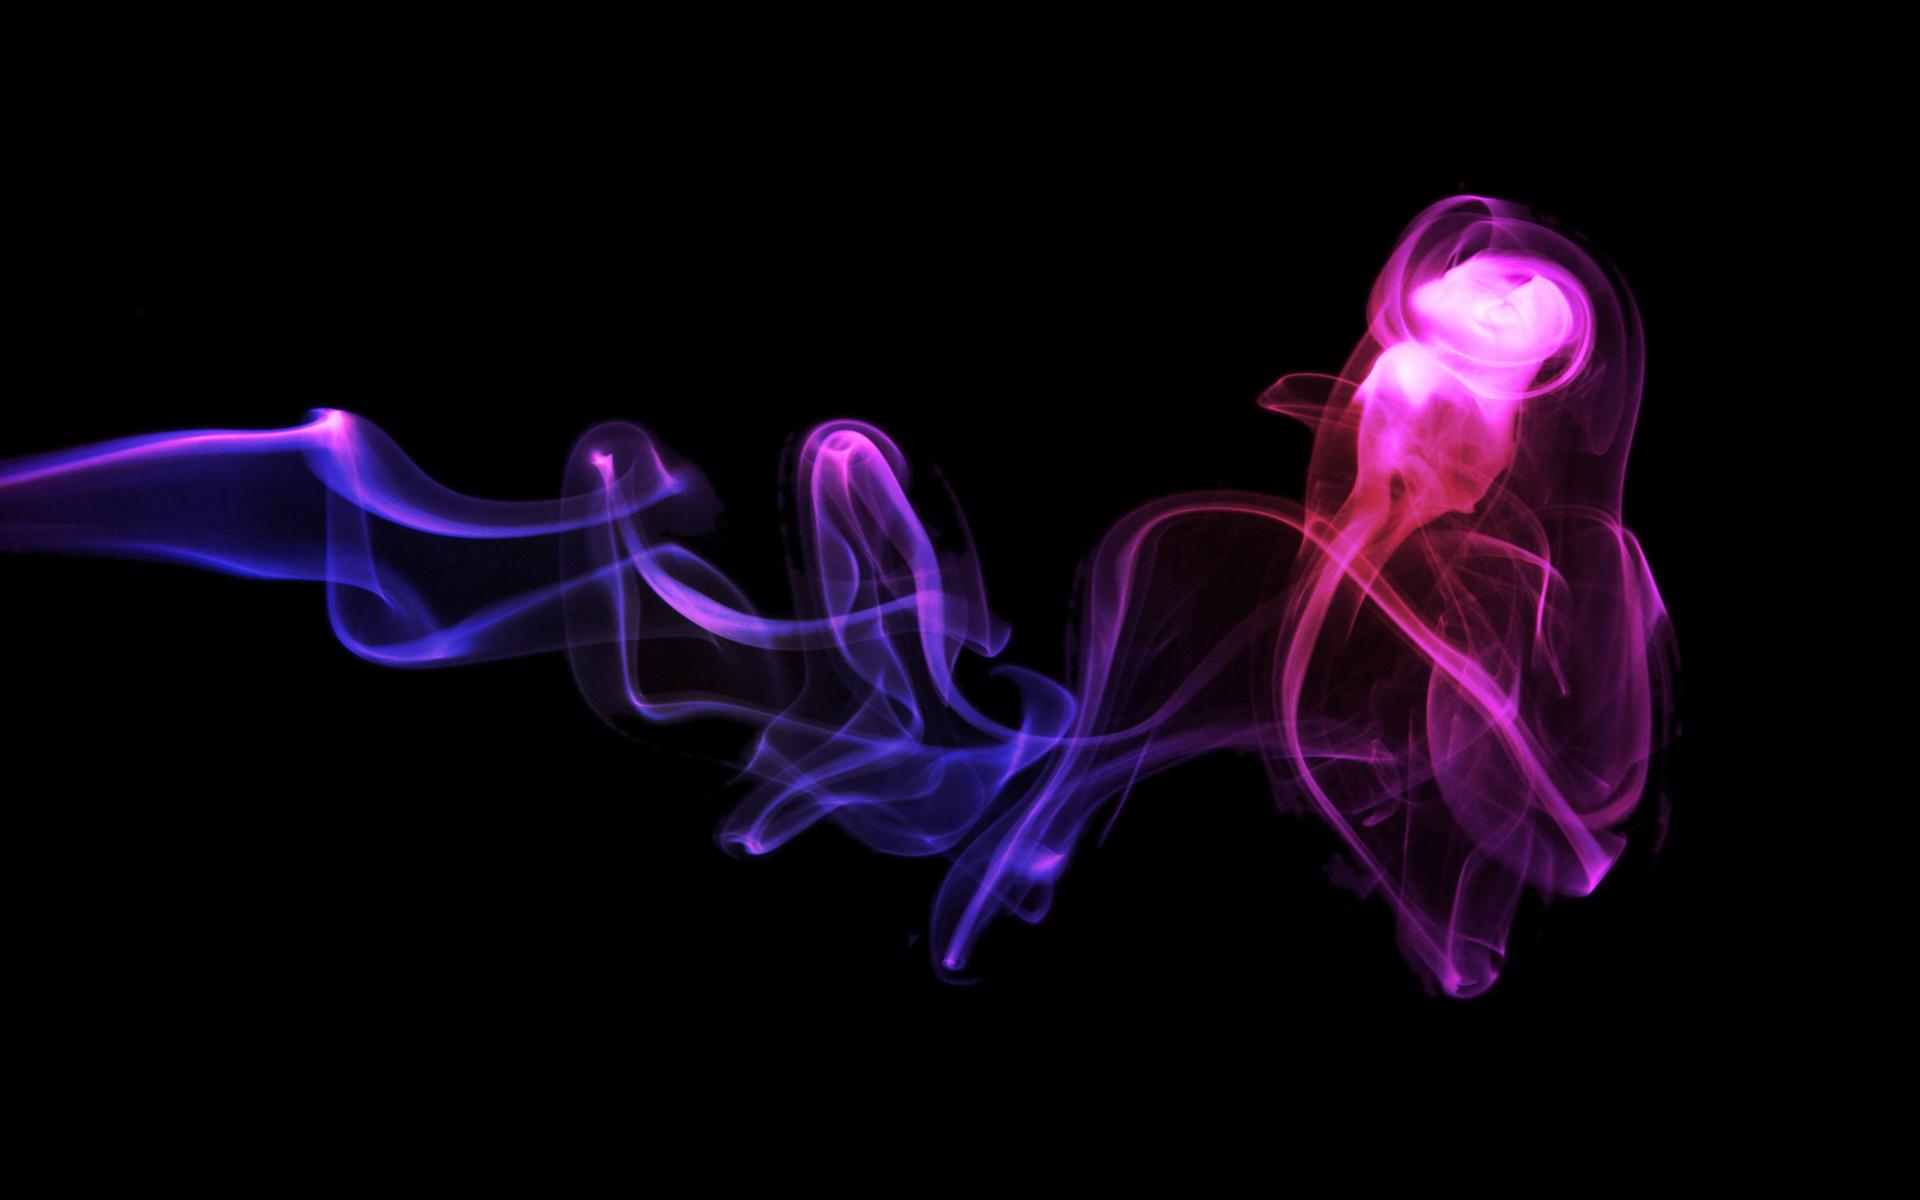 Smoke Wallpapers